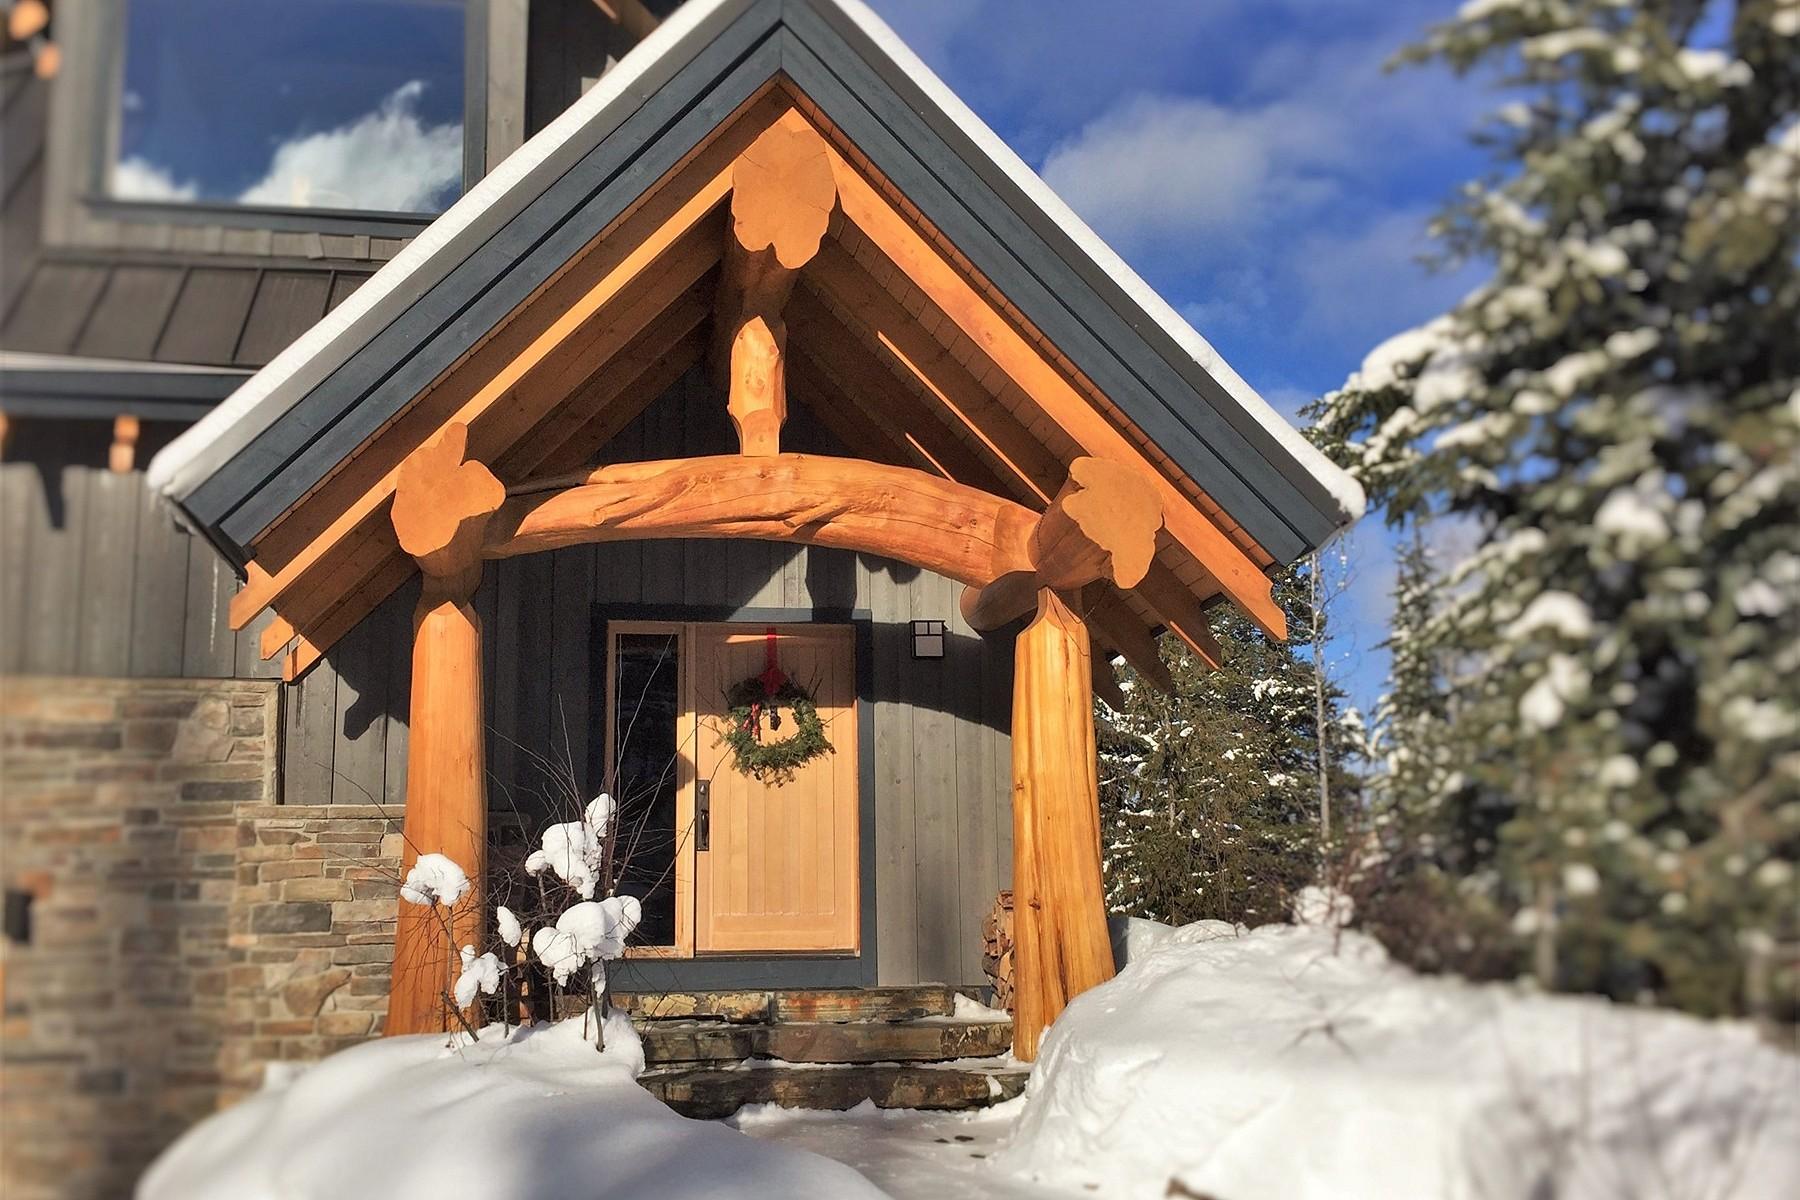 Casa Unifamiliar por un Venta en True Timber-Frame Chalet 1612 Purcell Woods Close Golden, British Columbia V0A1H0 Canadá